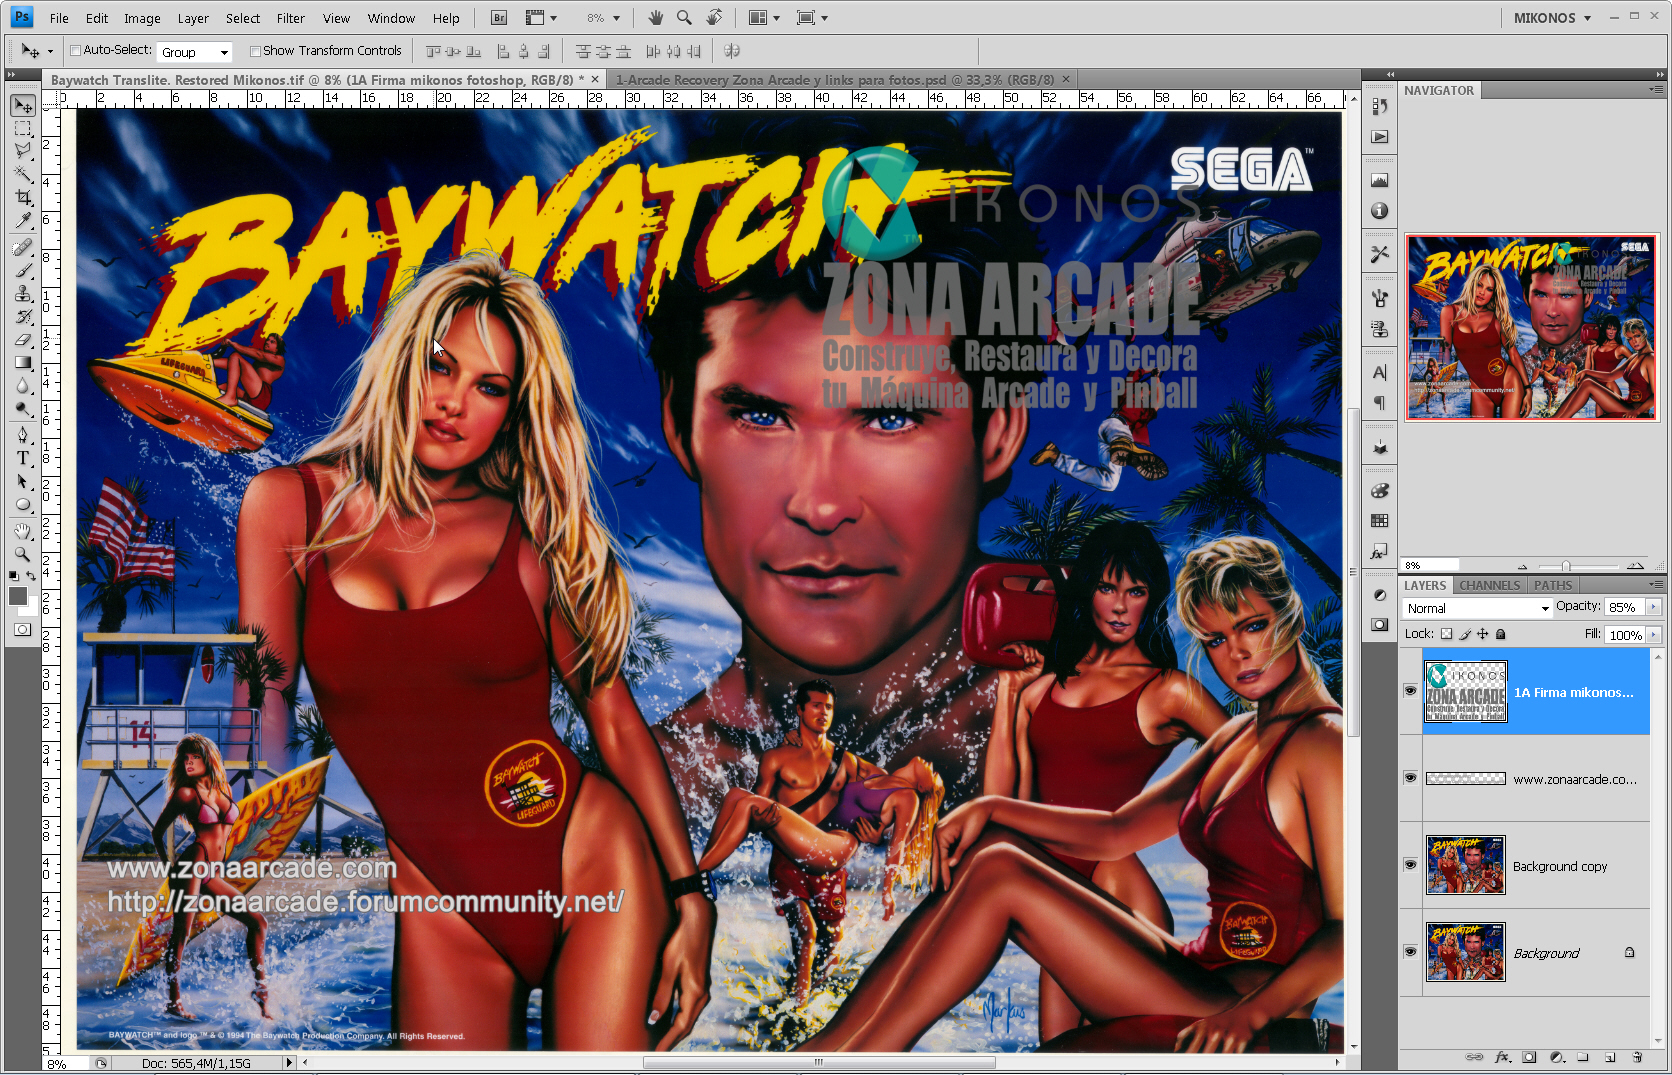 Baywatch%20Pinball%20Translite.%20In%20restoration%20process%20Mikonos1.jpg